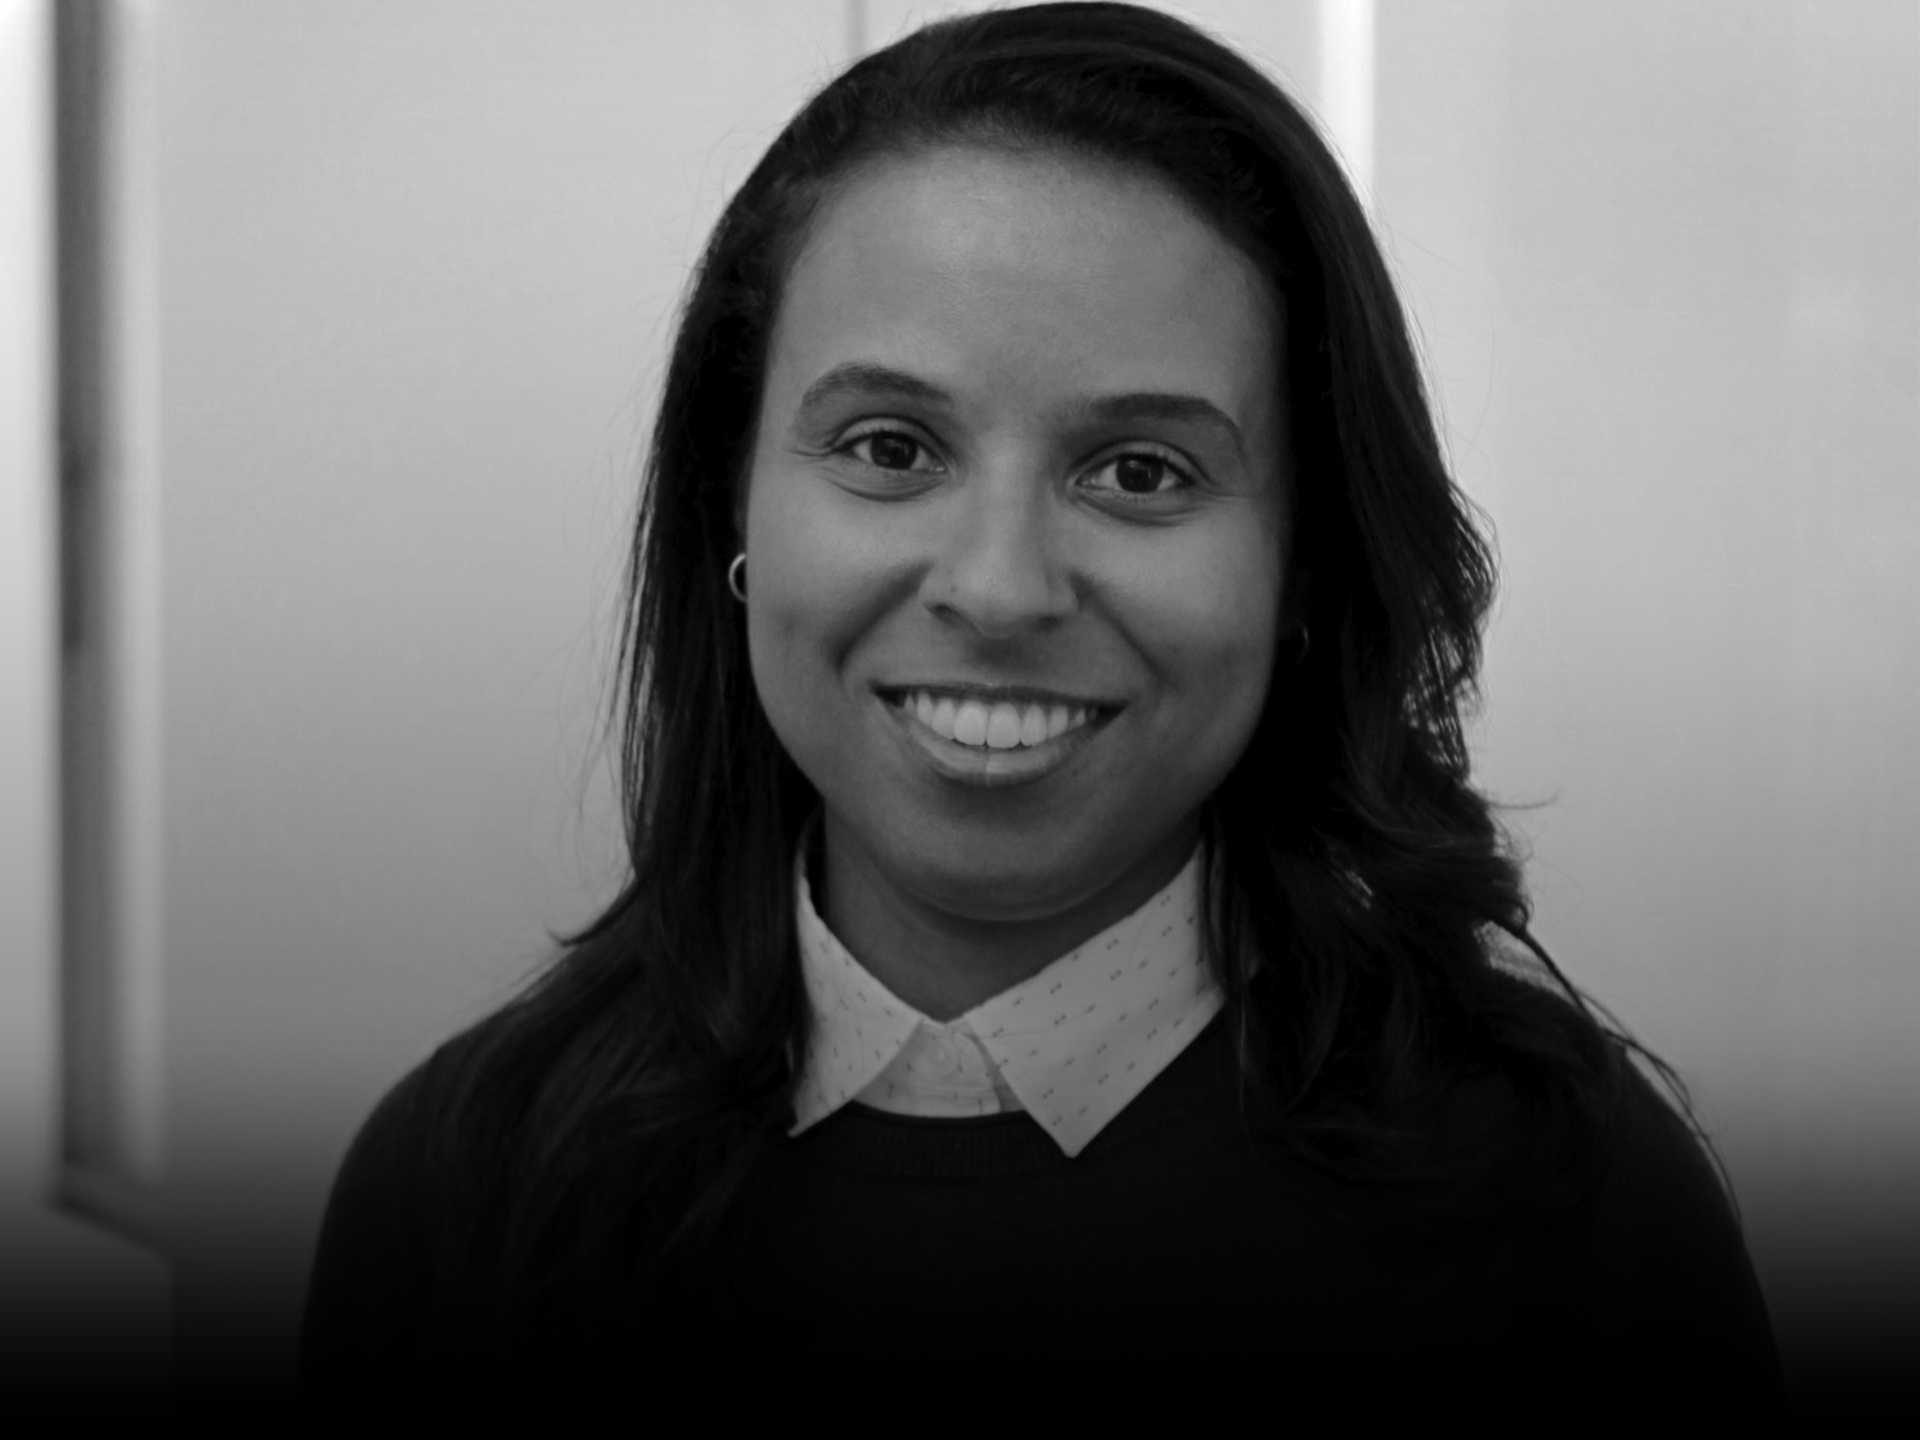 Image of Jeannette Perez